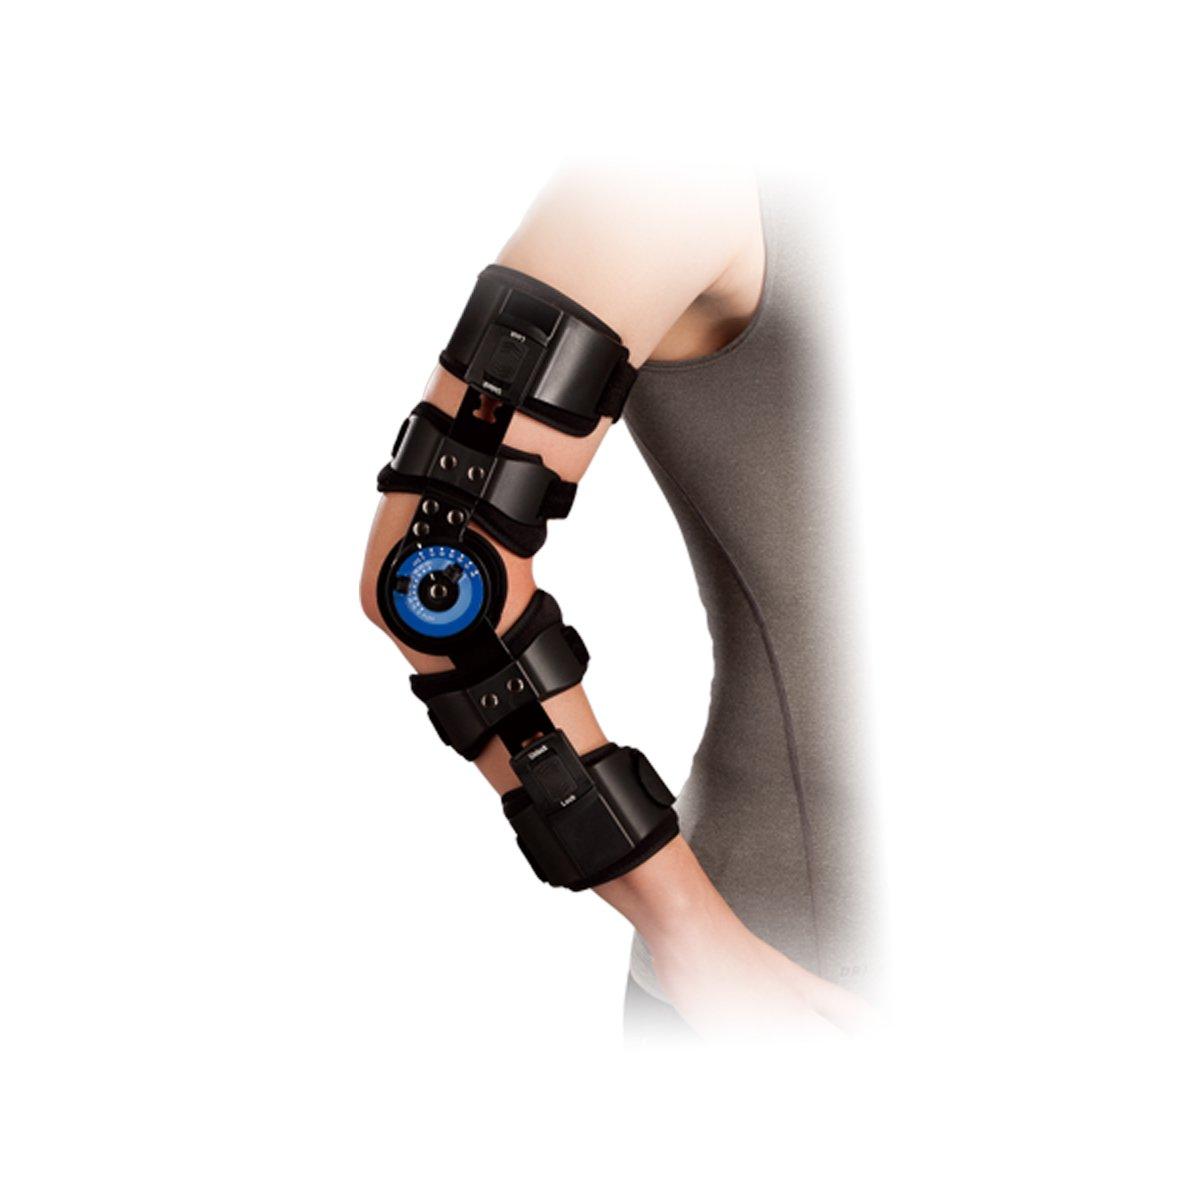 Orthomen ROM Elbow Brace - Size: Universal (Left)